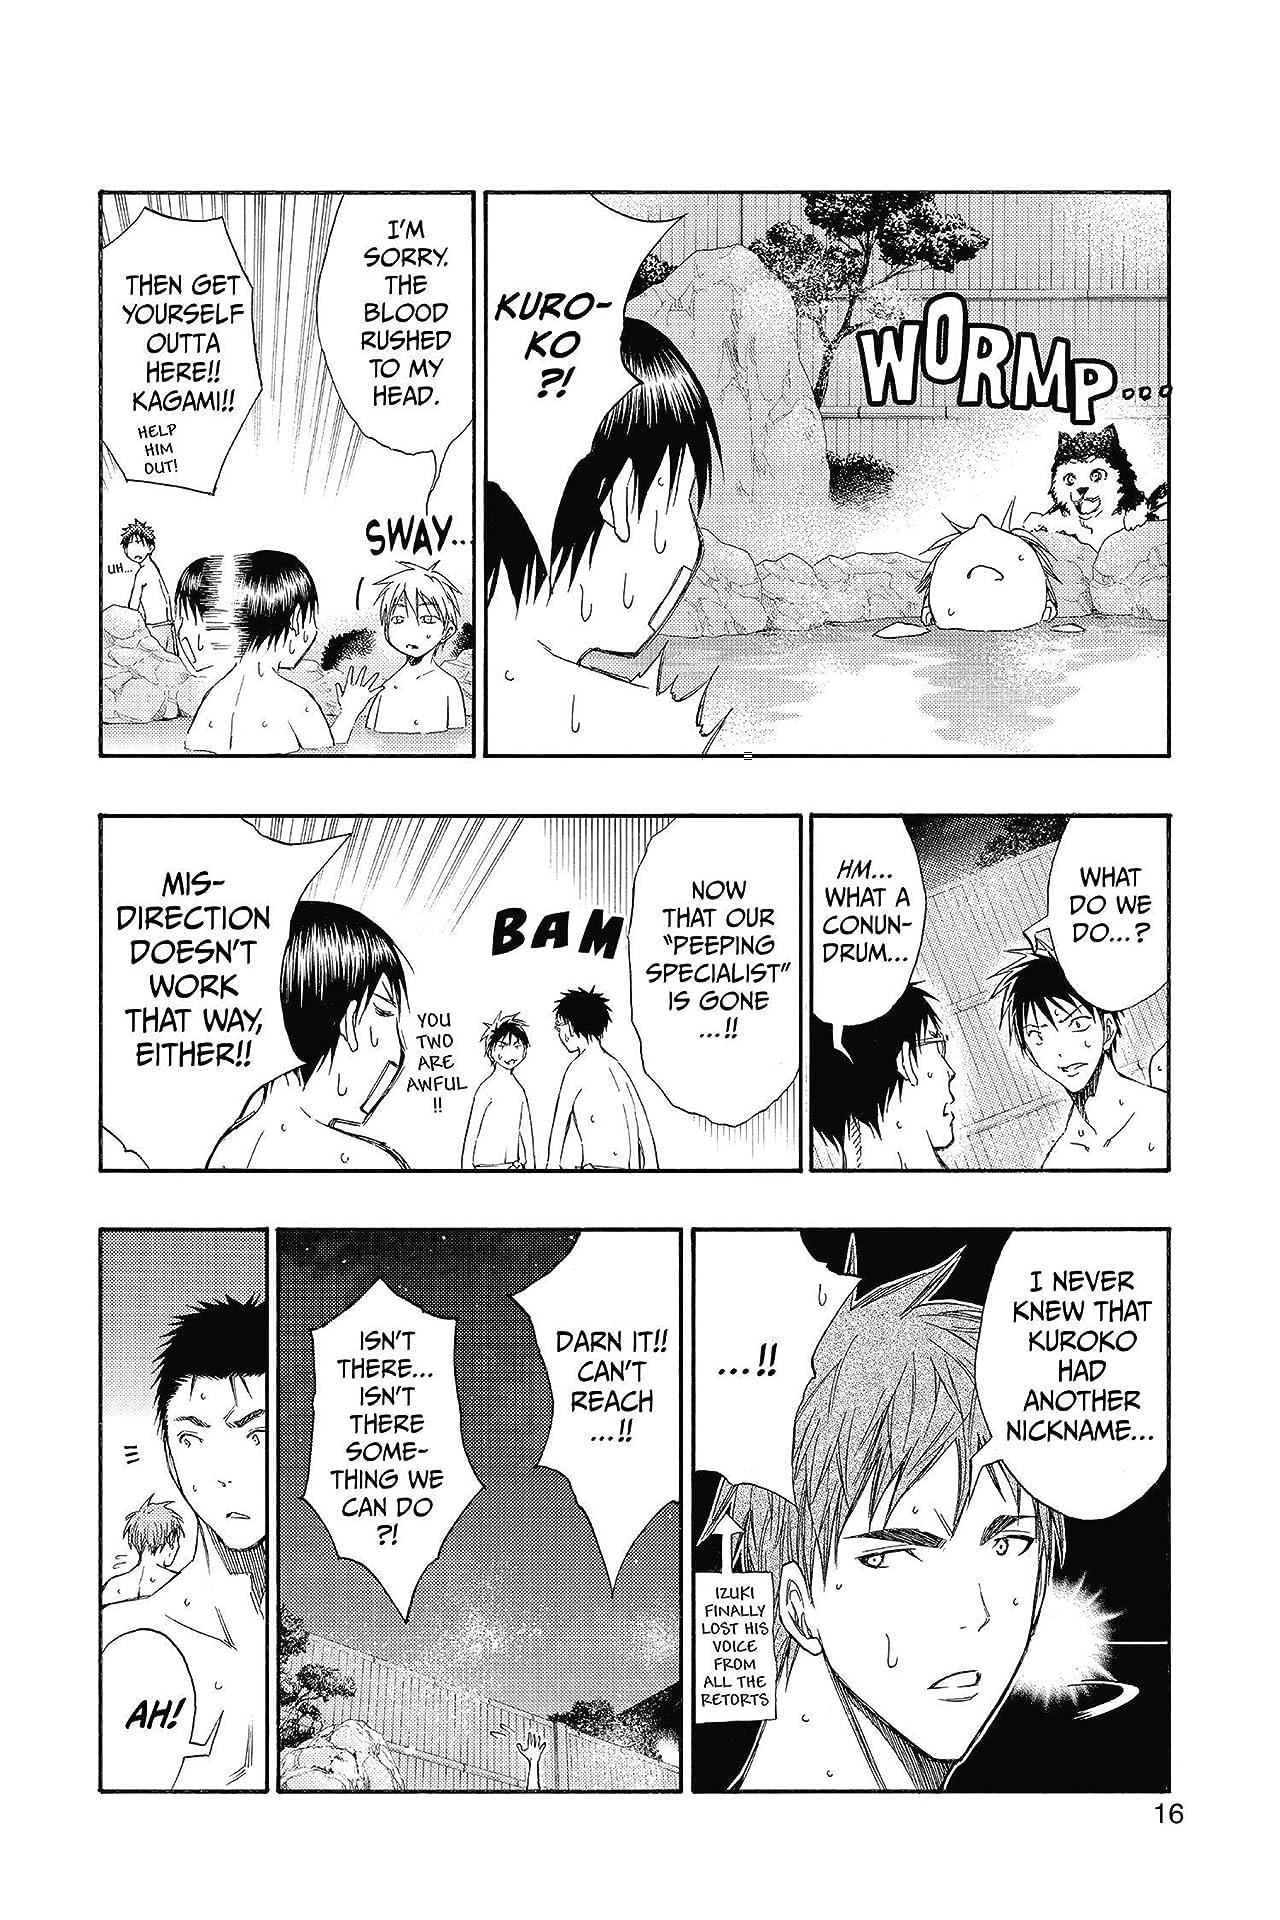 Kuroko's Basketball Vol. 7